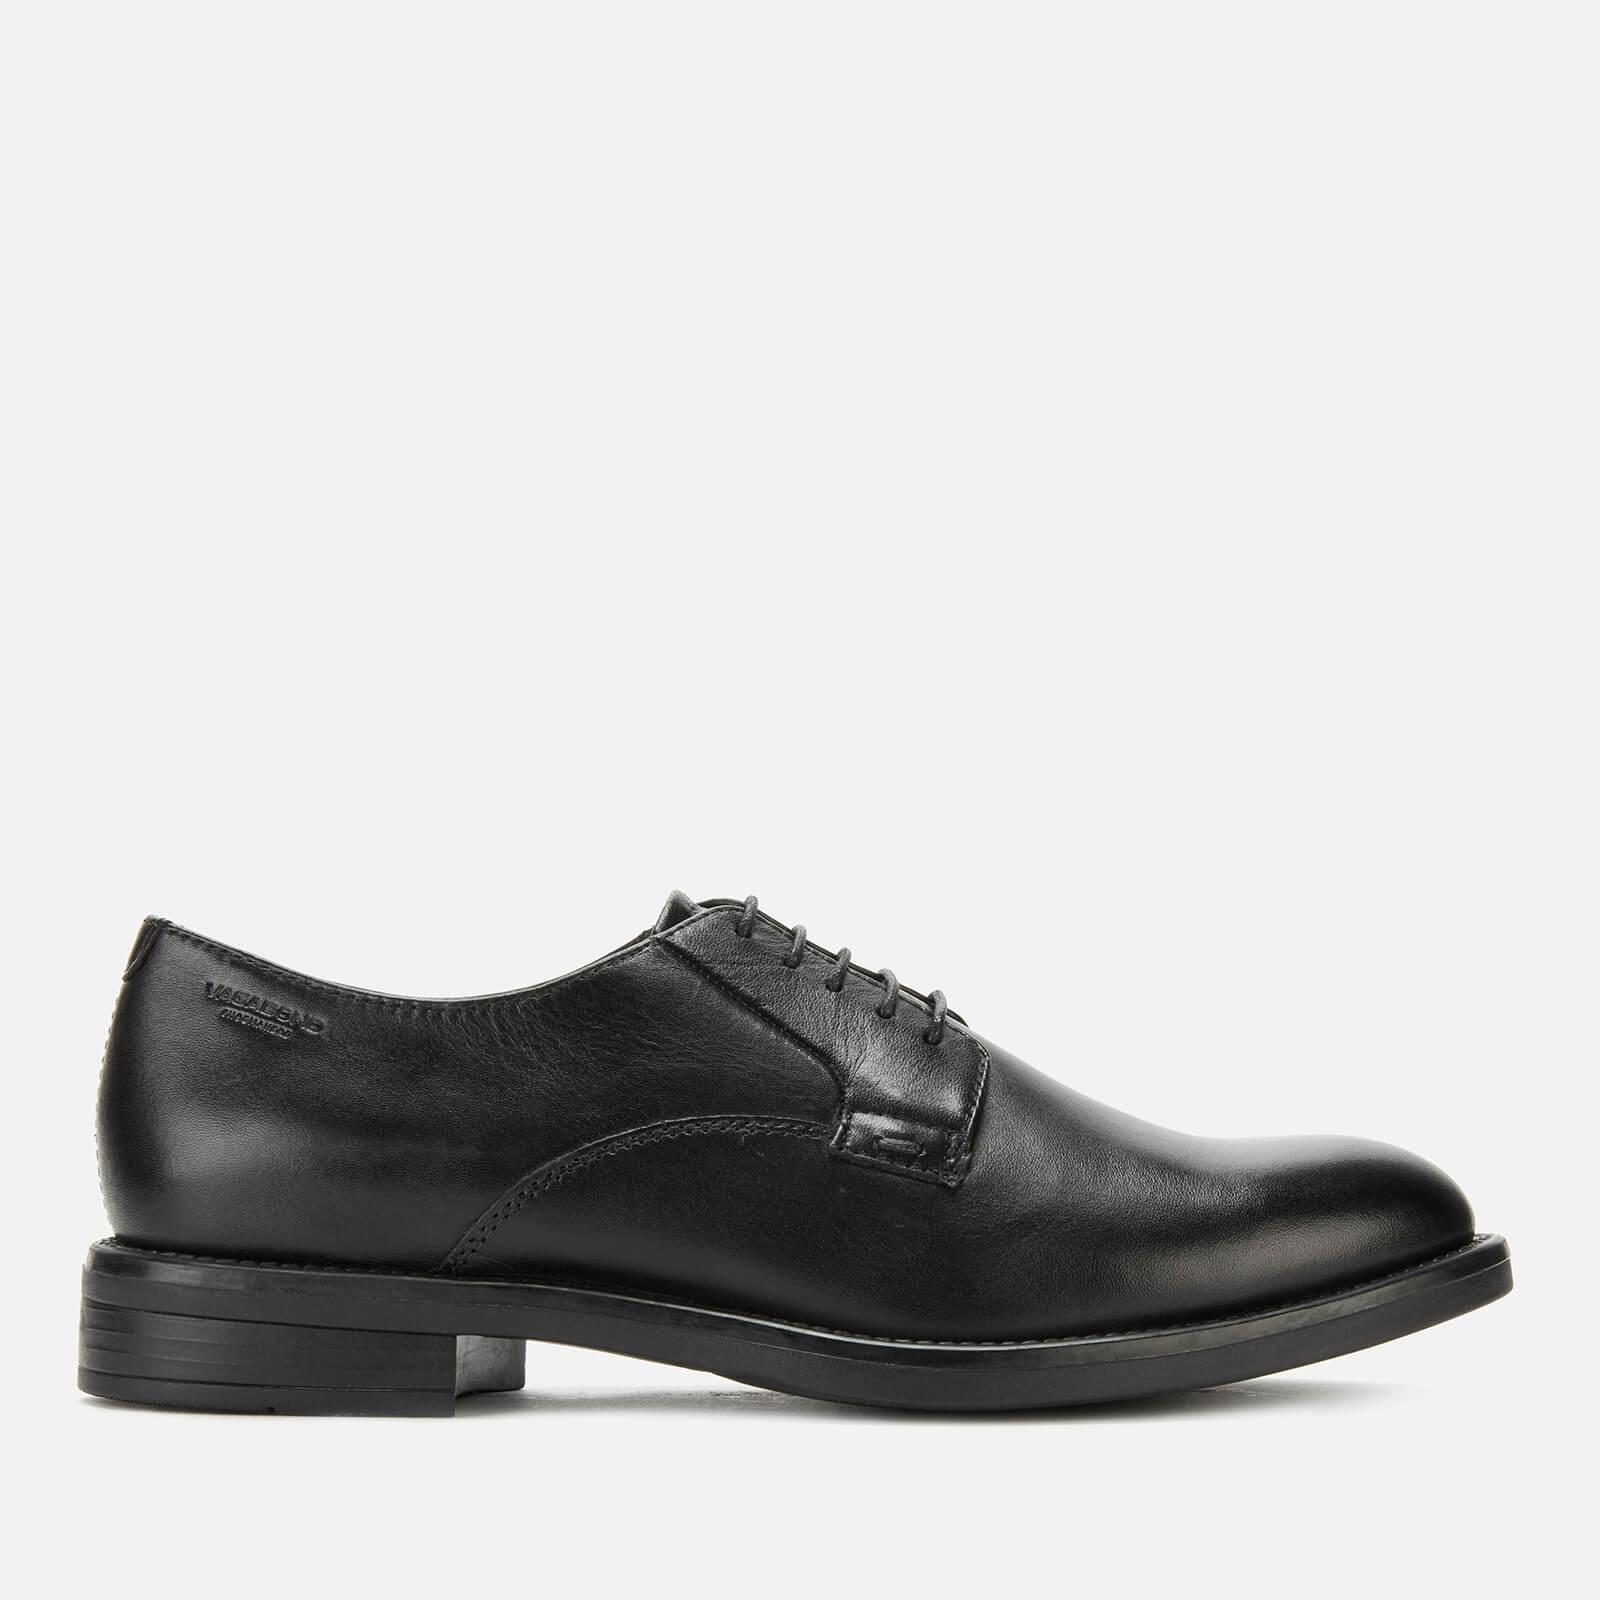 Vagabond Women's Amina Leather Derby Shoes - Black - UK 7 - Black